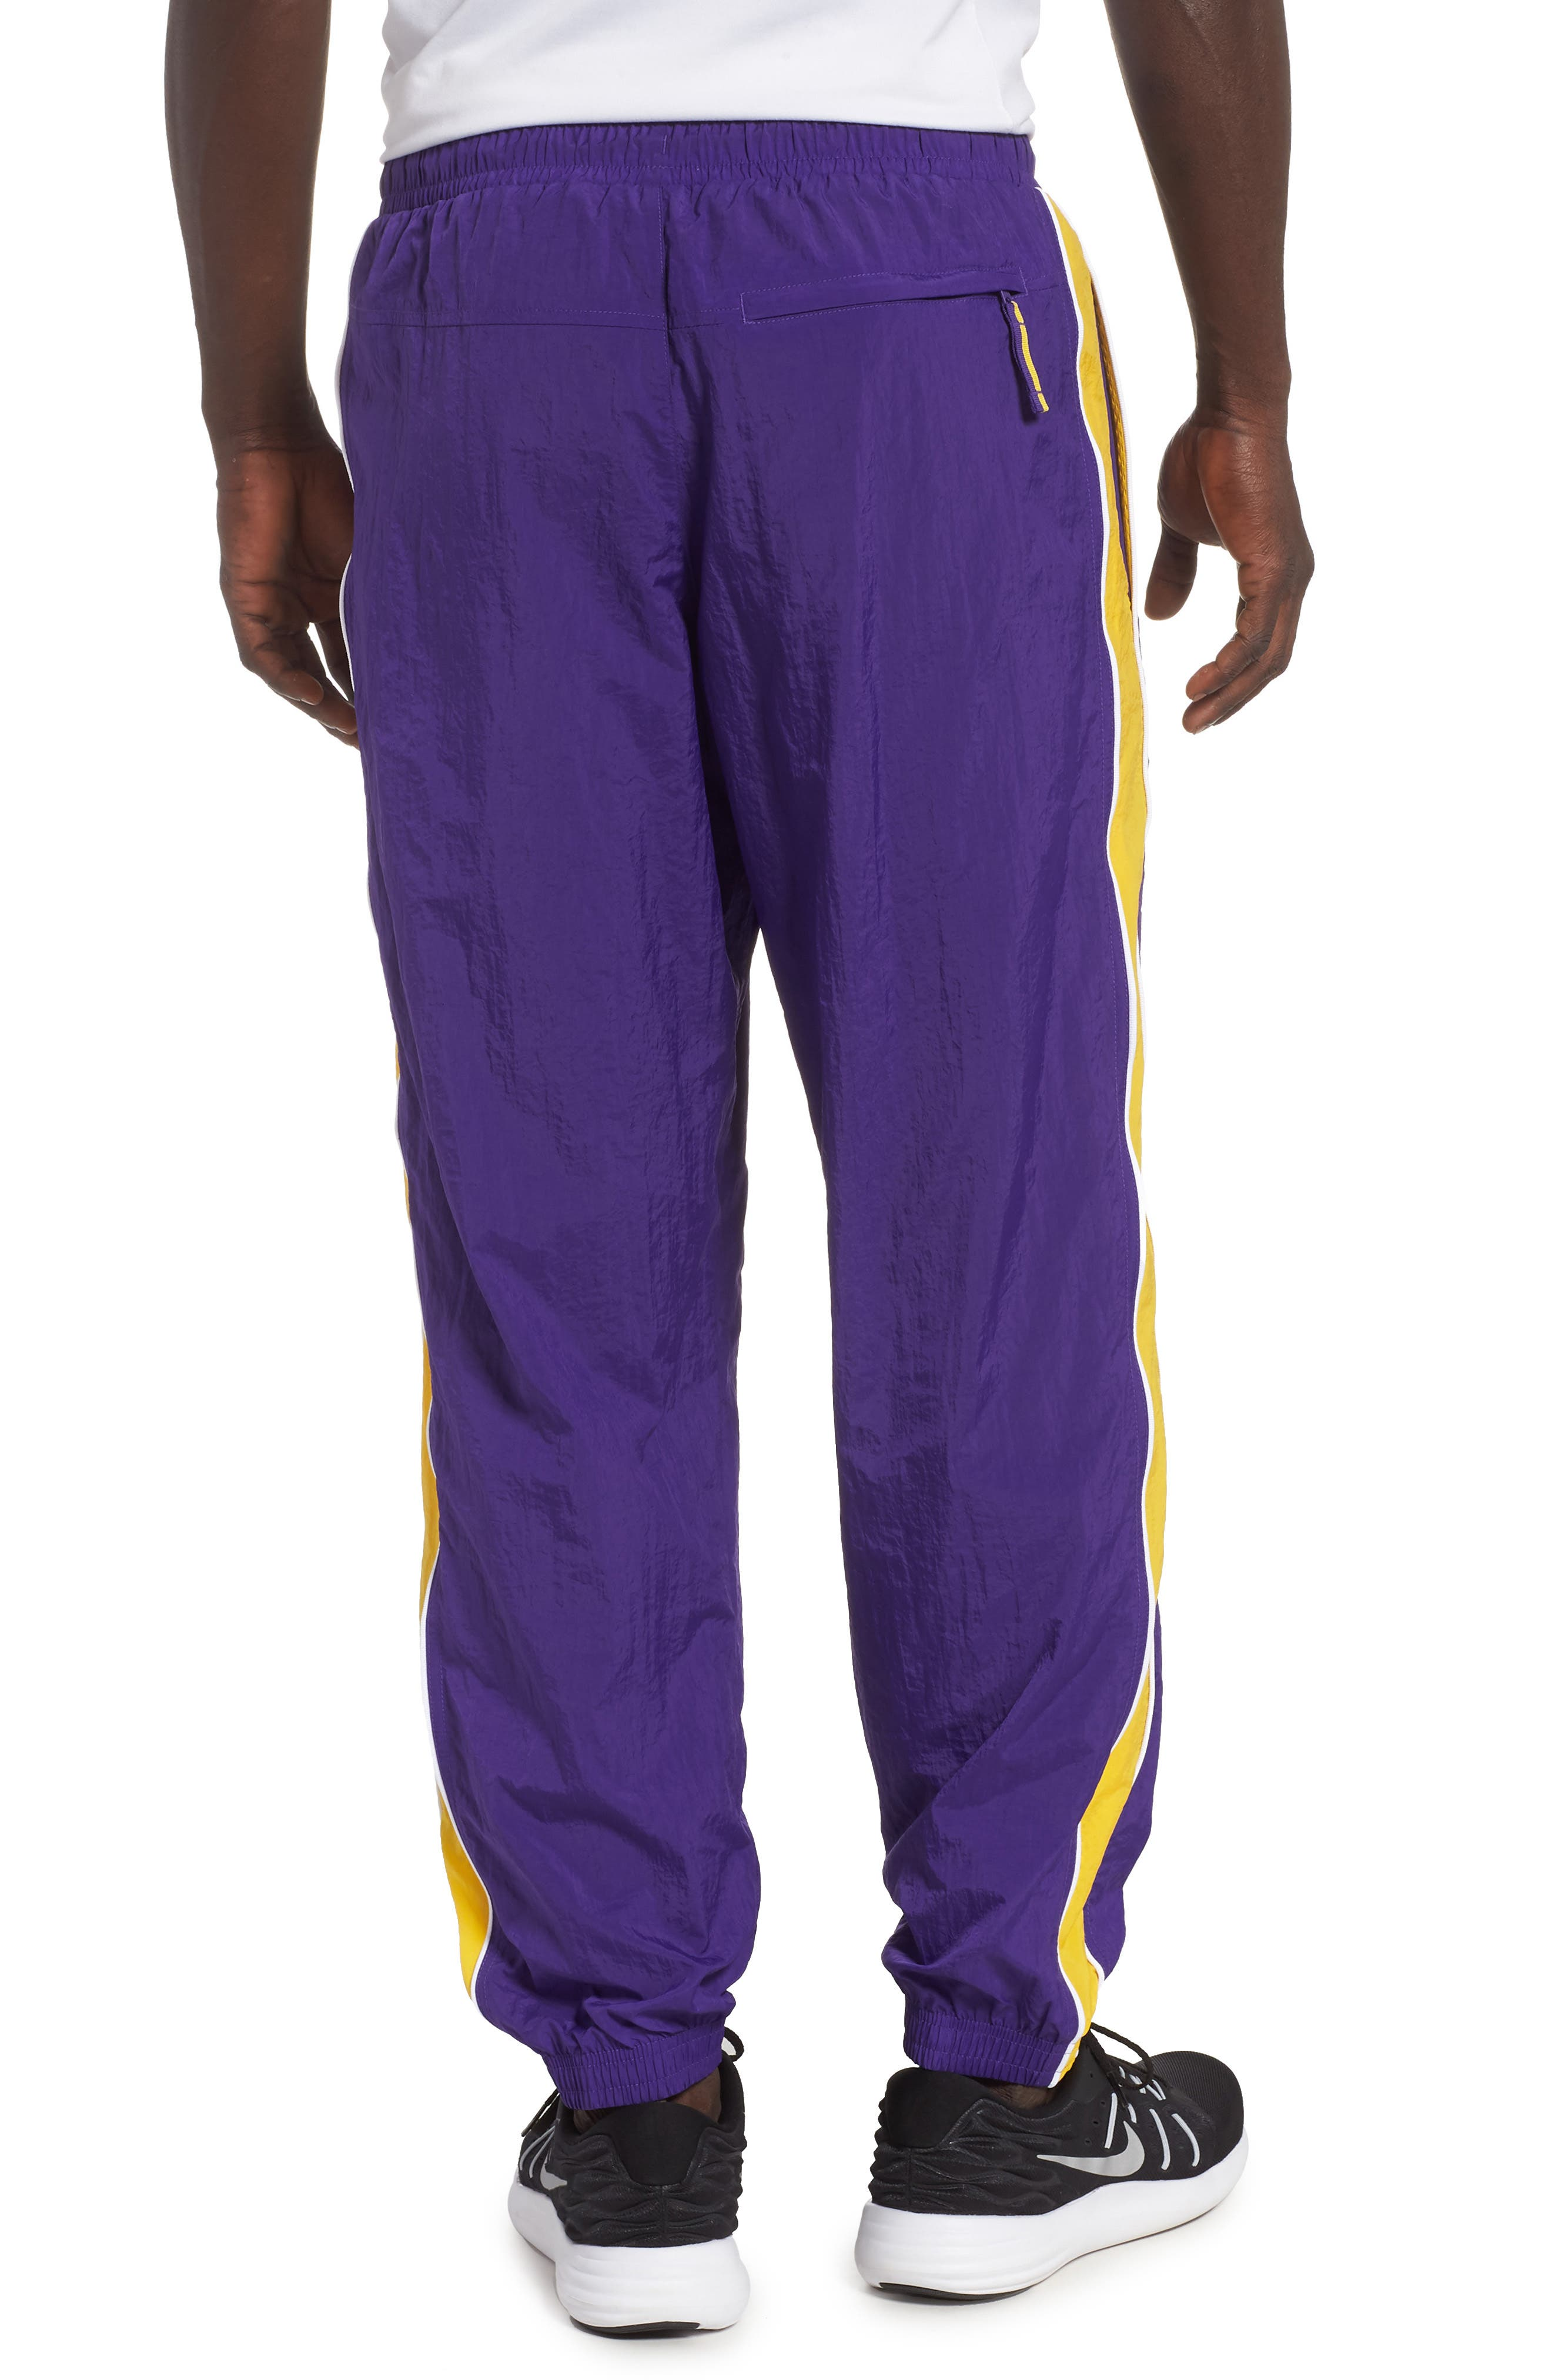 LA Lakers Tracksuit Pants,                             Alternate thumbnail 2, color,                             504